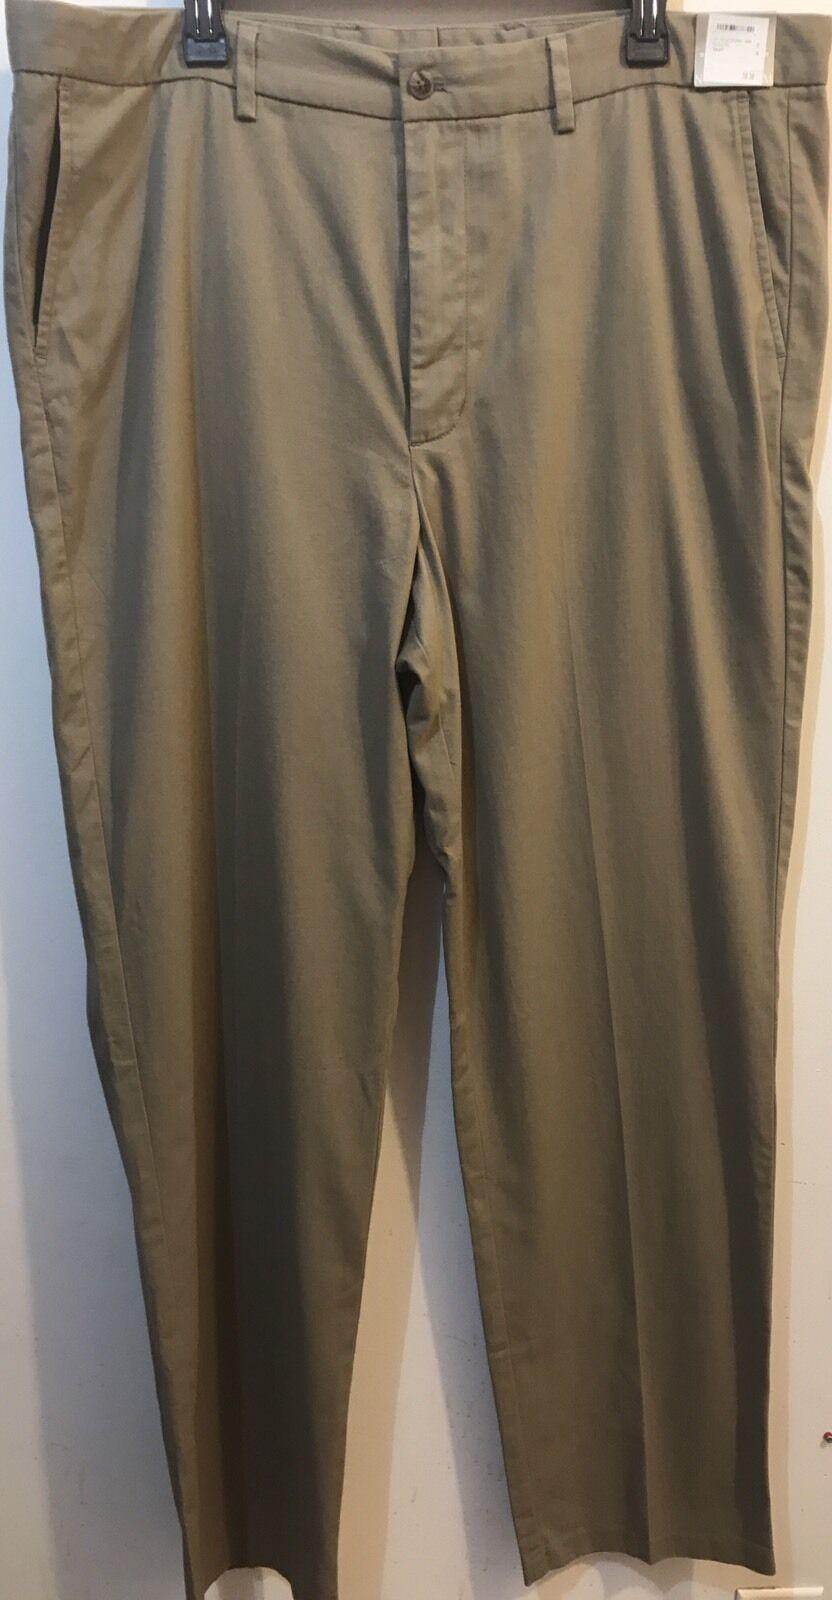 Men's Nordstrom Trouser Pants Smart Care Wrinkle Free Size 40W x 34L in khaki